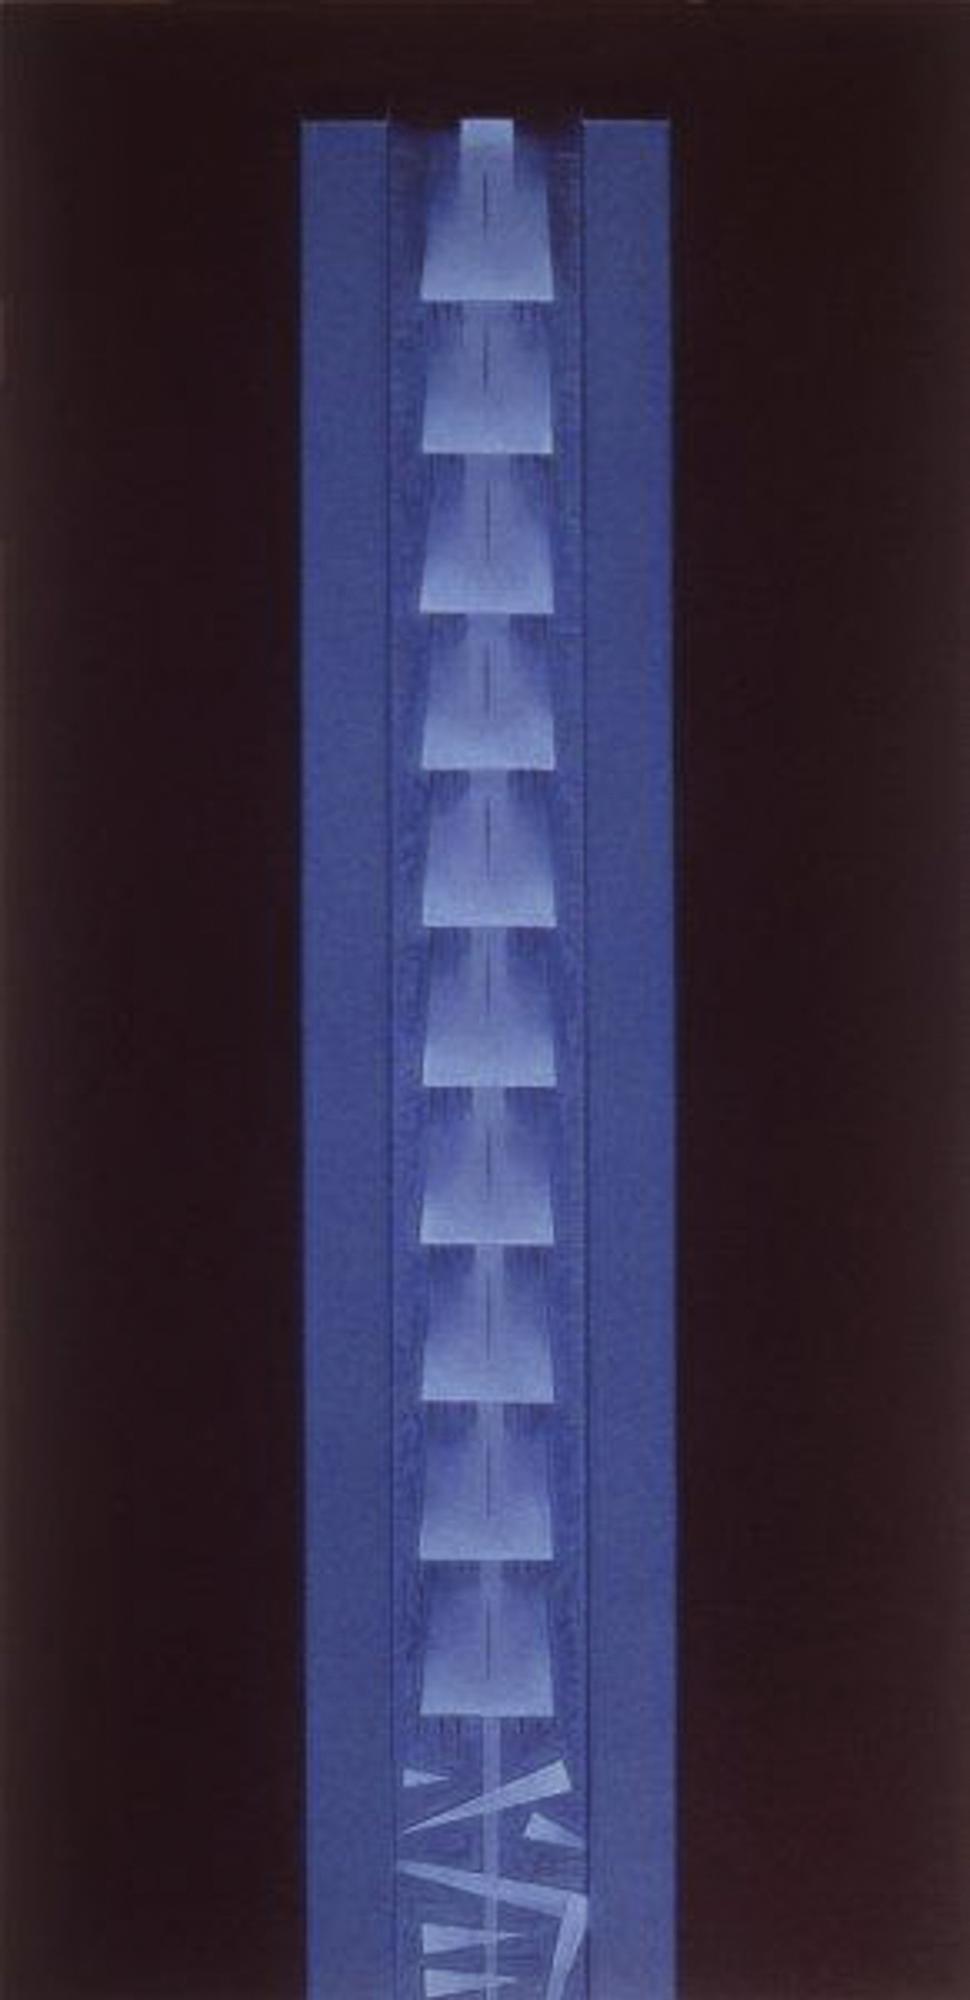 Stele II (blu), 1999